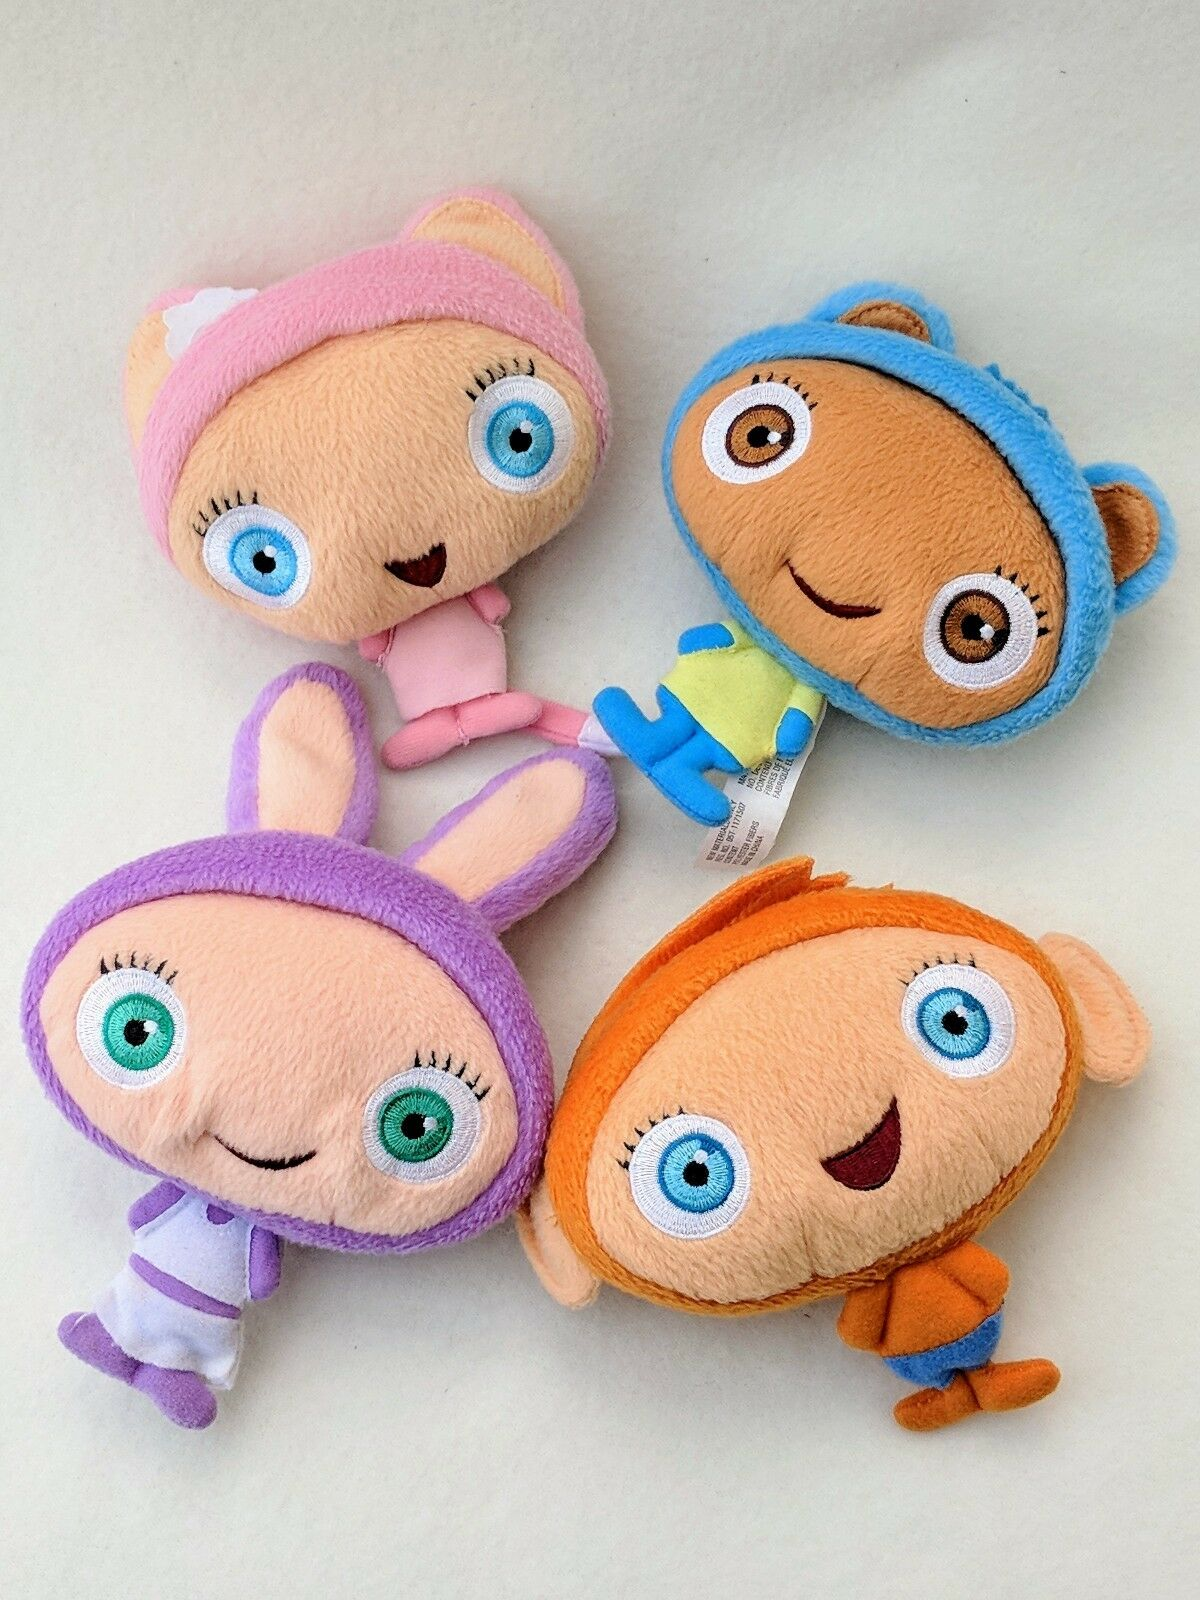 Waybuloo soft toy set nok nok nok tok - jojo de li lau lau cuddly teddy bundle menge 642513